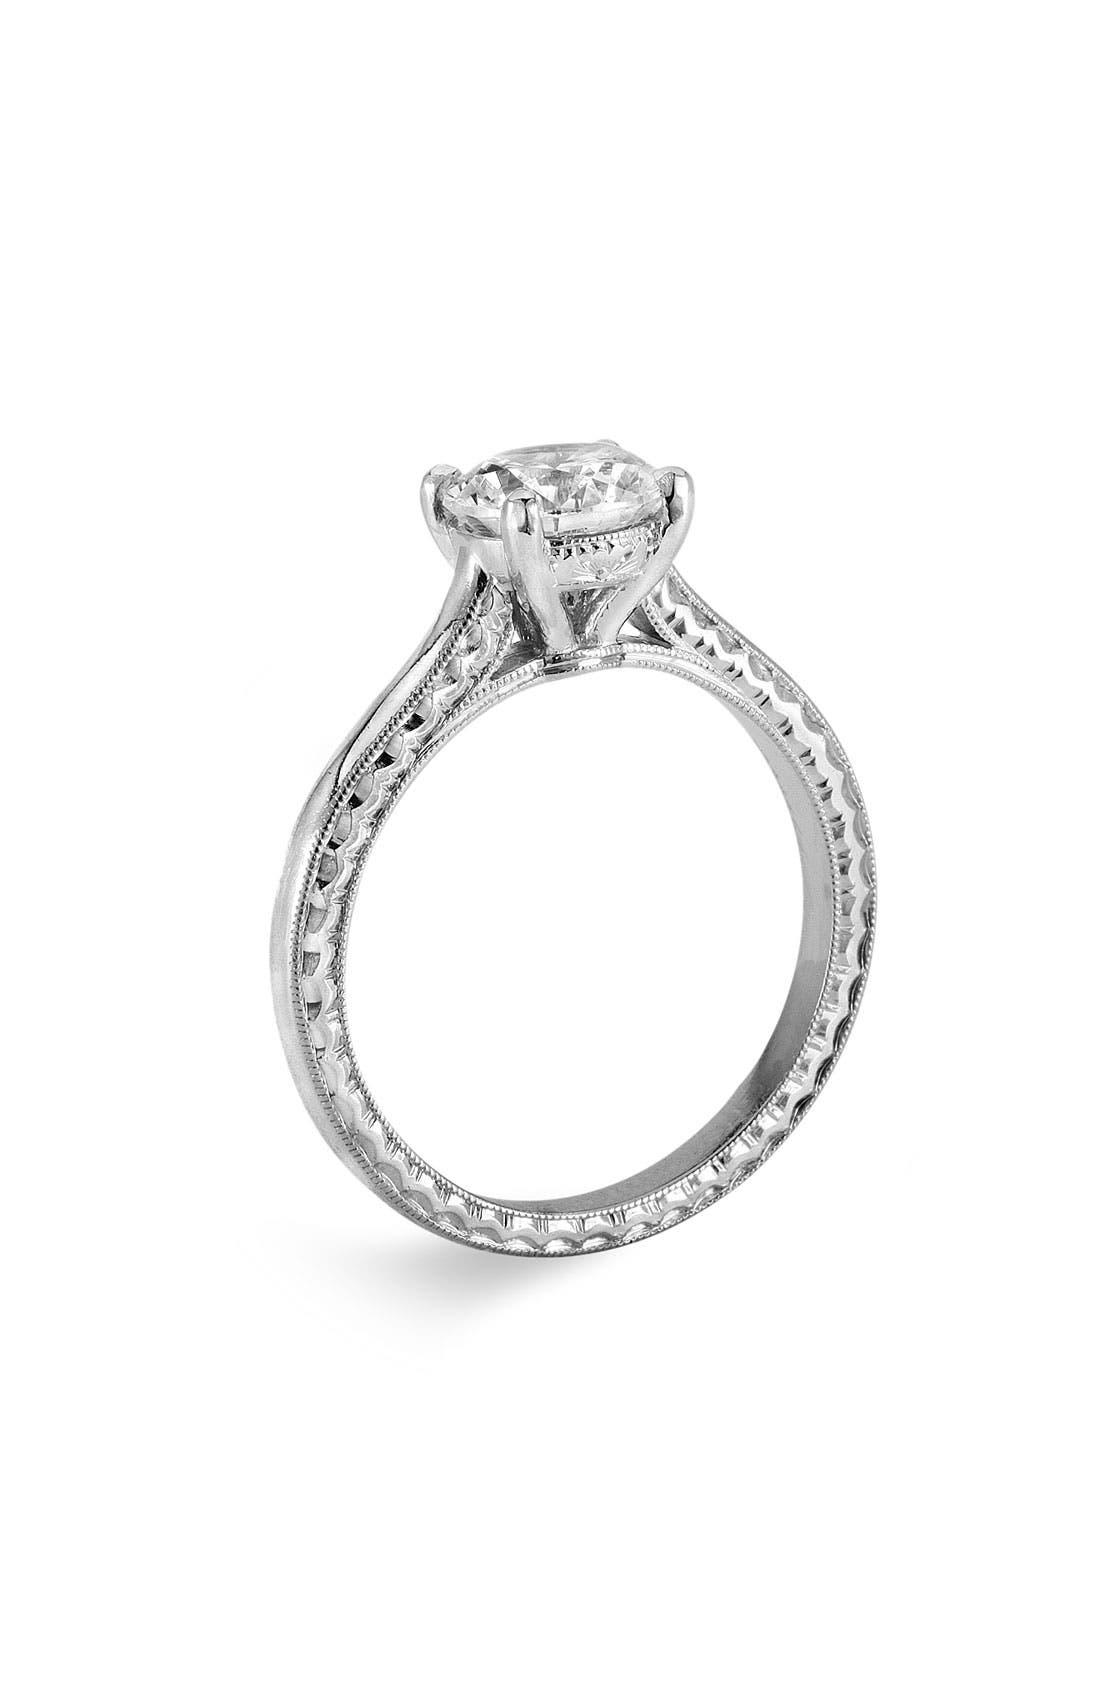 Main Image - Jack Kelége 'Silhouette' Engagement Ring Setting